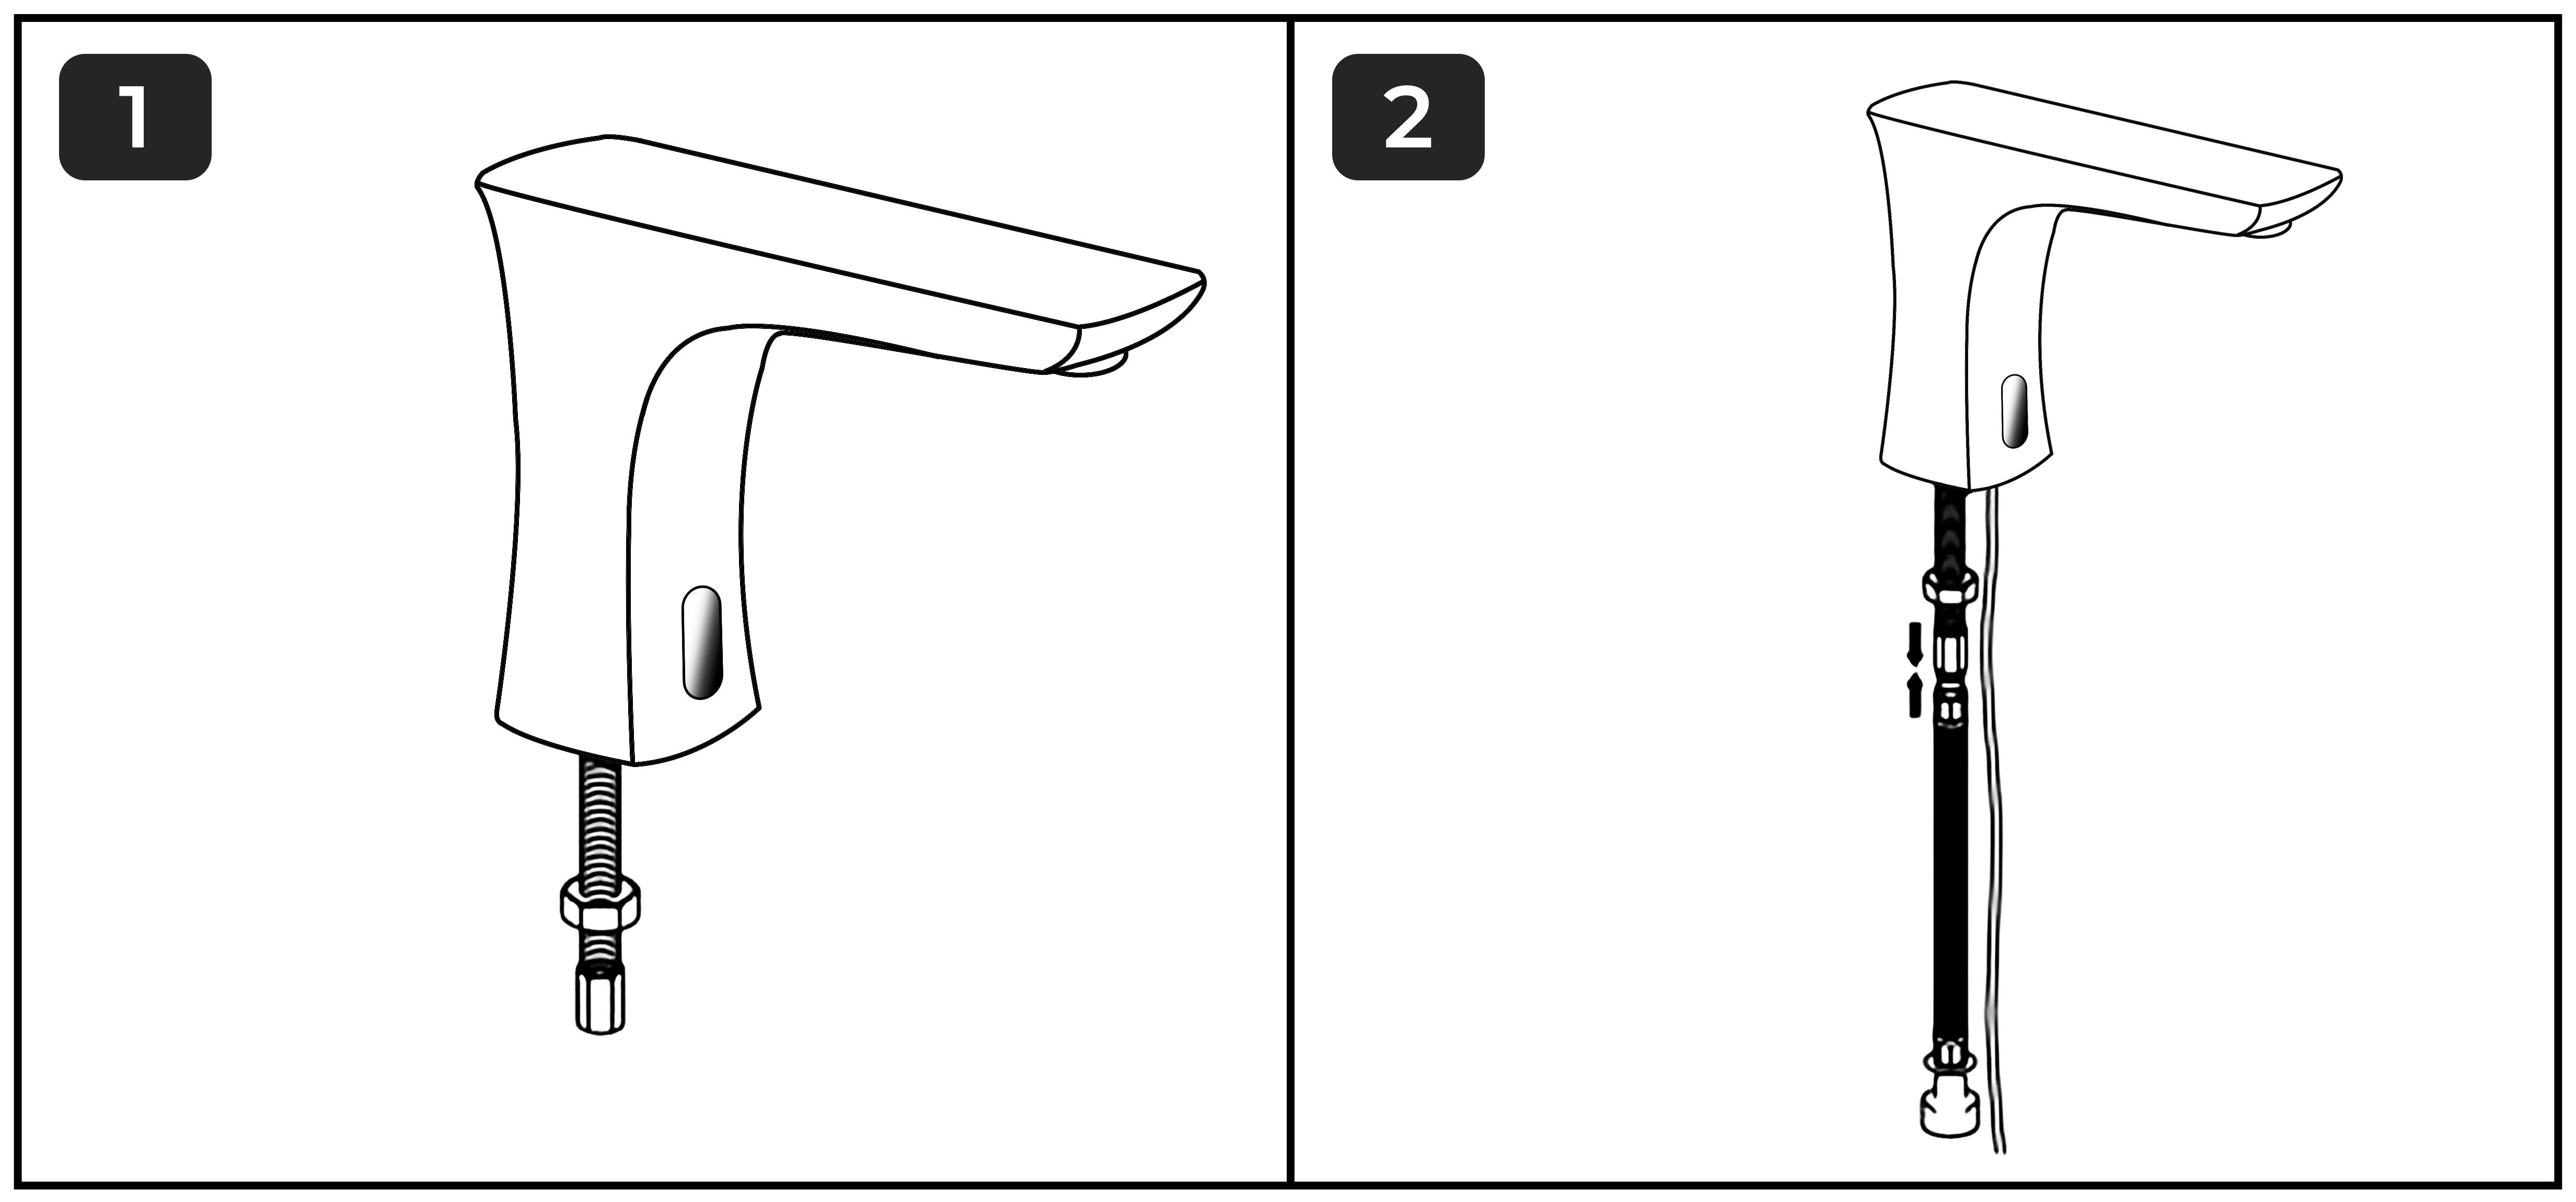 Touchless Basin Automatic Commercial Sensor Faucet